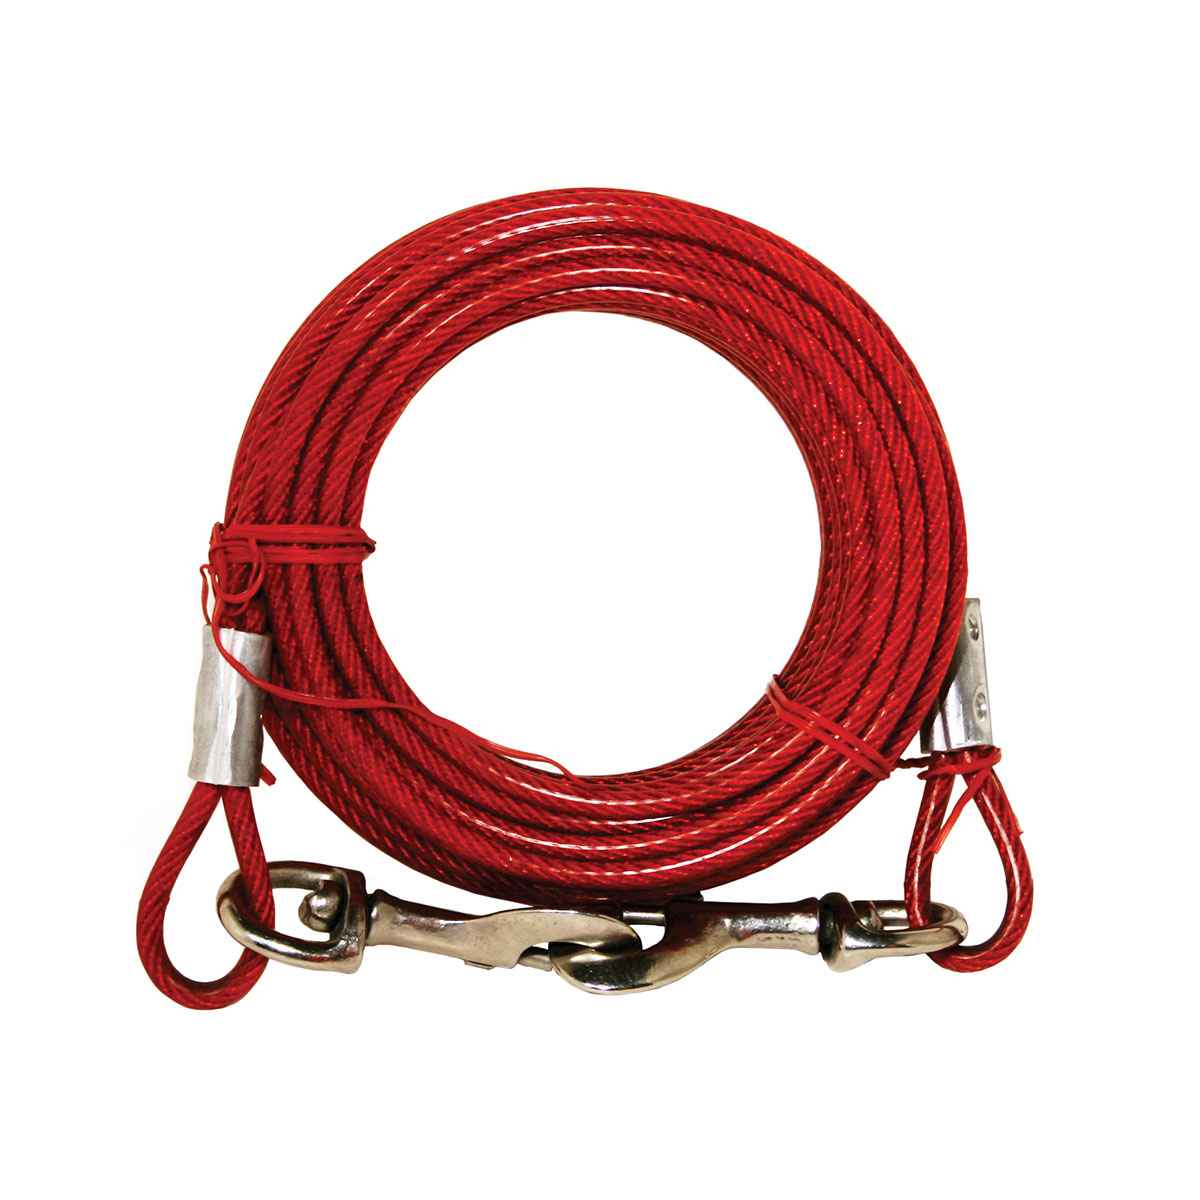 Prevue Pet 20 Dog Tie-Out Cable' - 2120